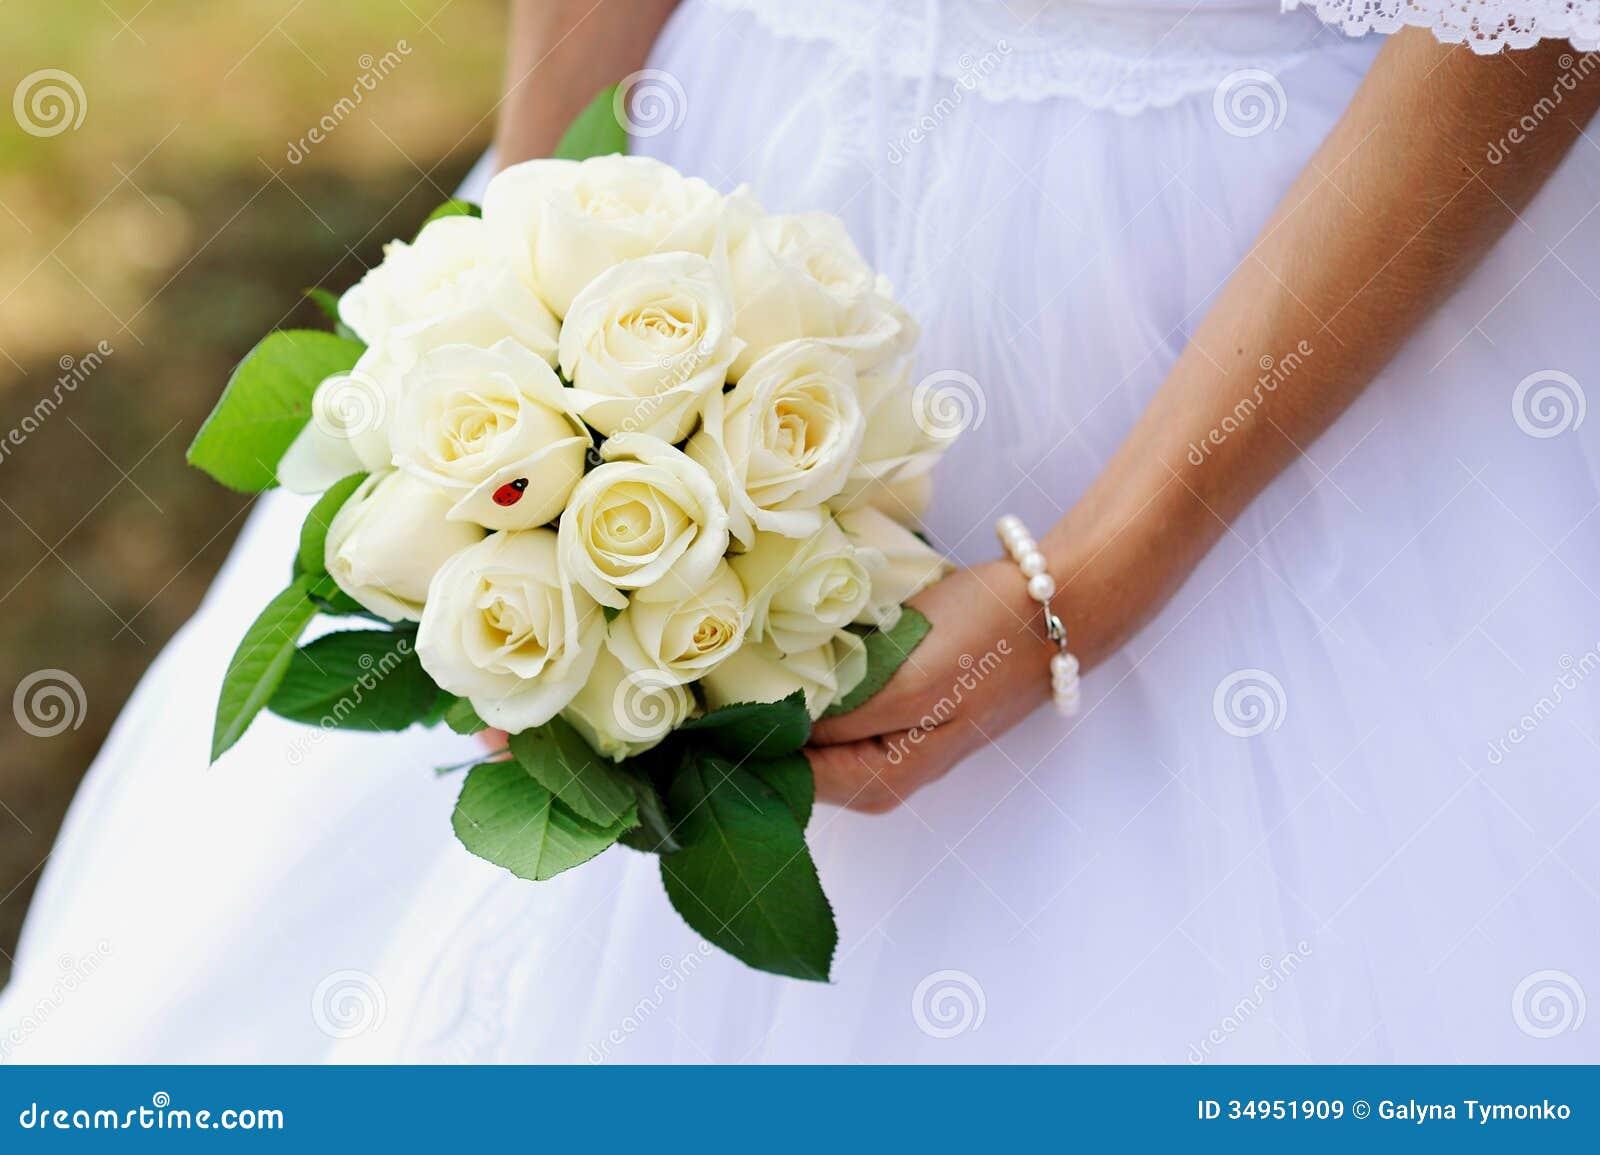 Wedding bouquet stock image. Image of love, elegance ...